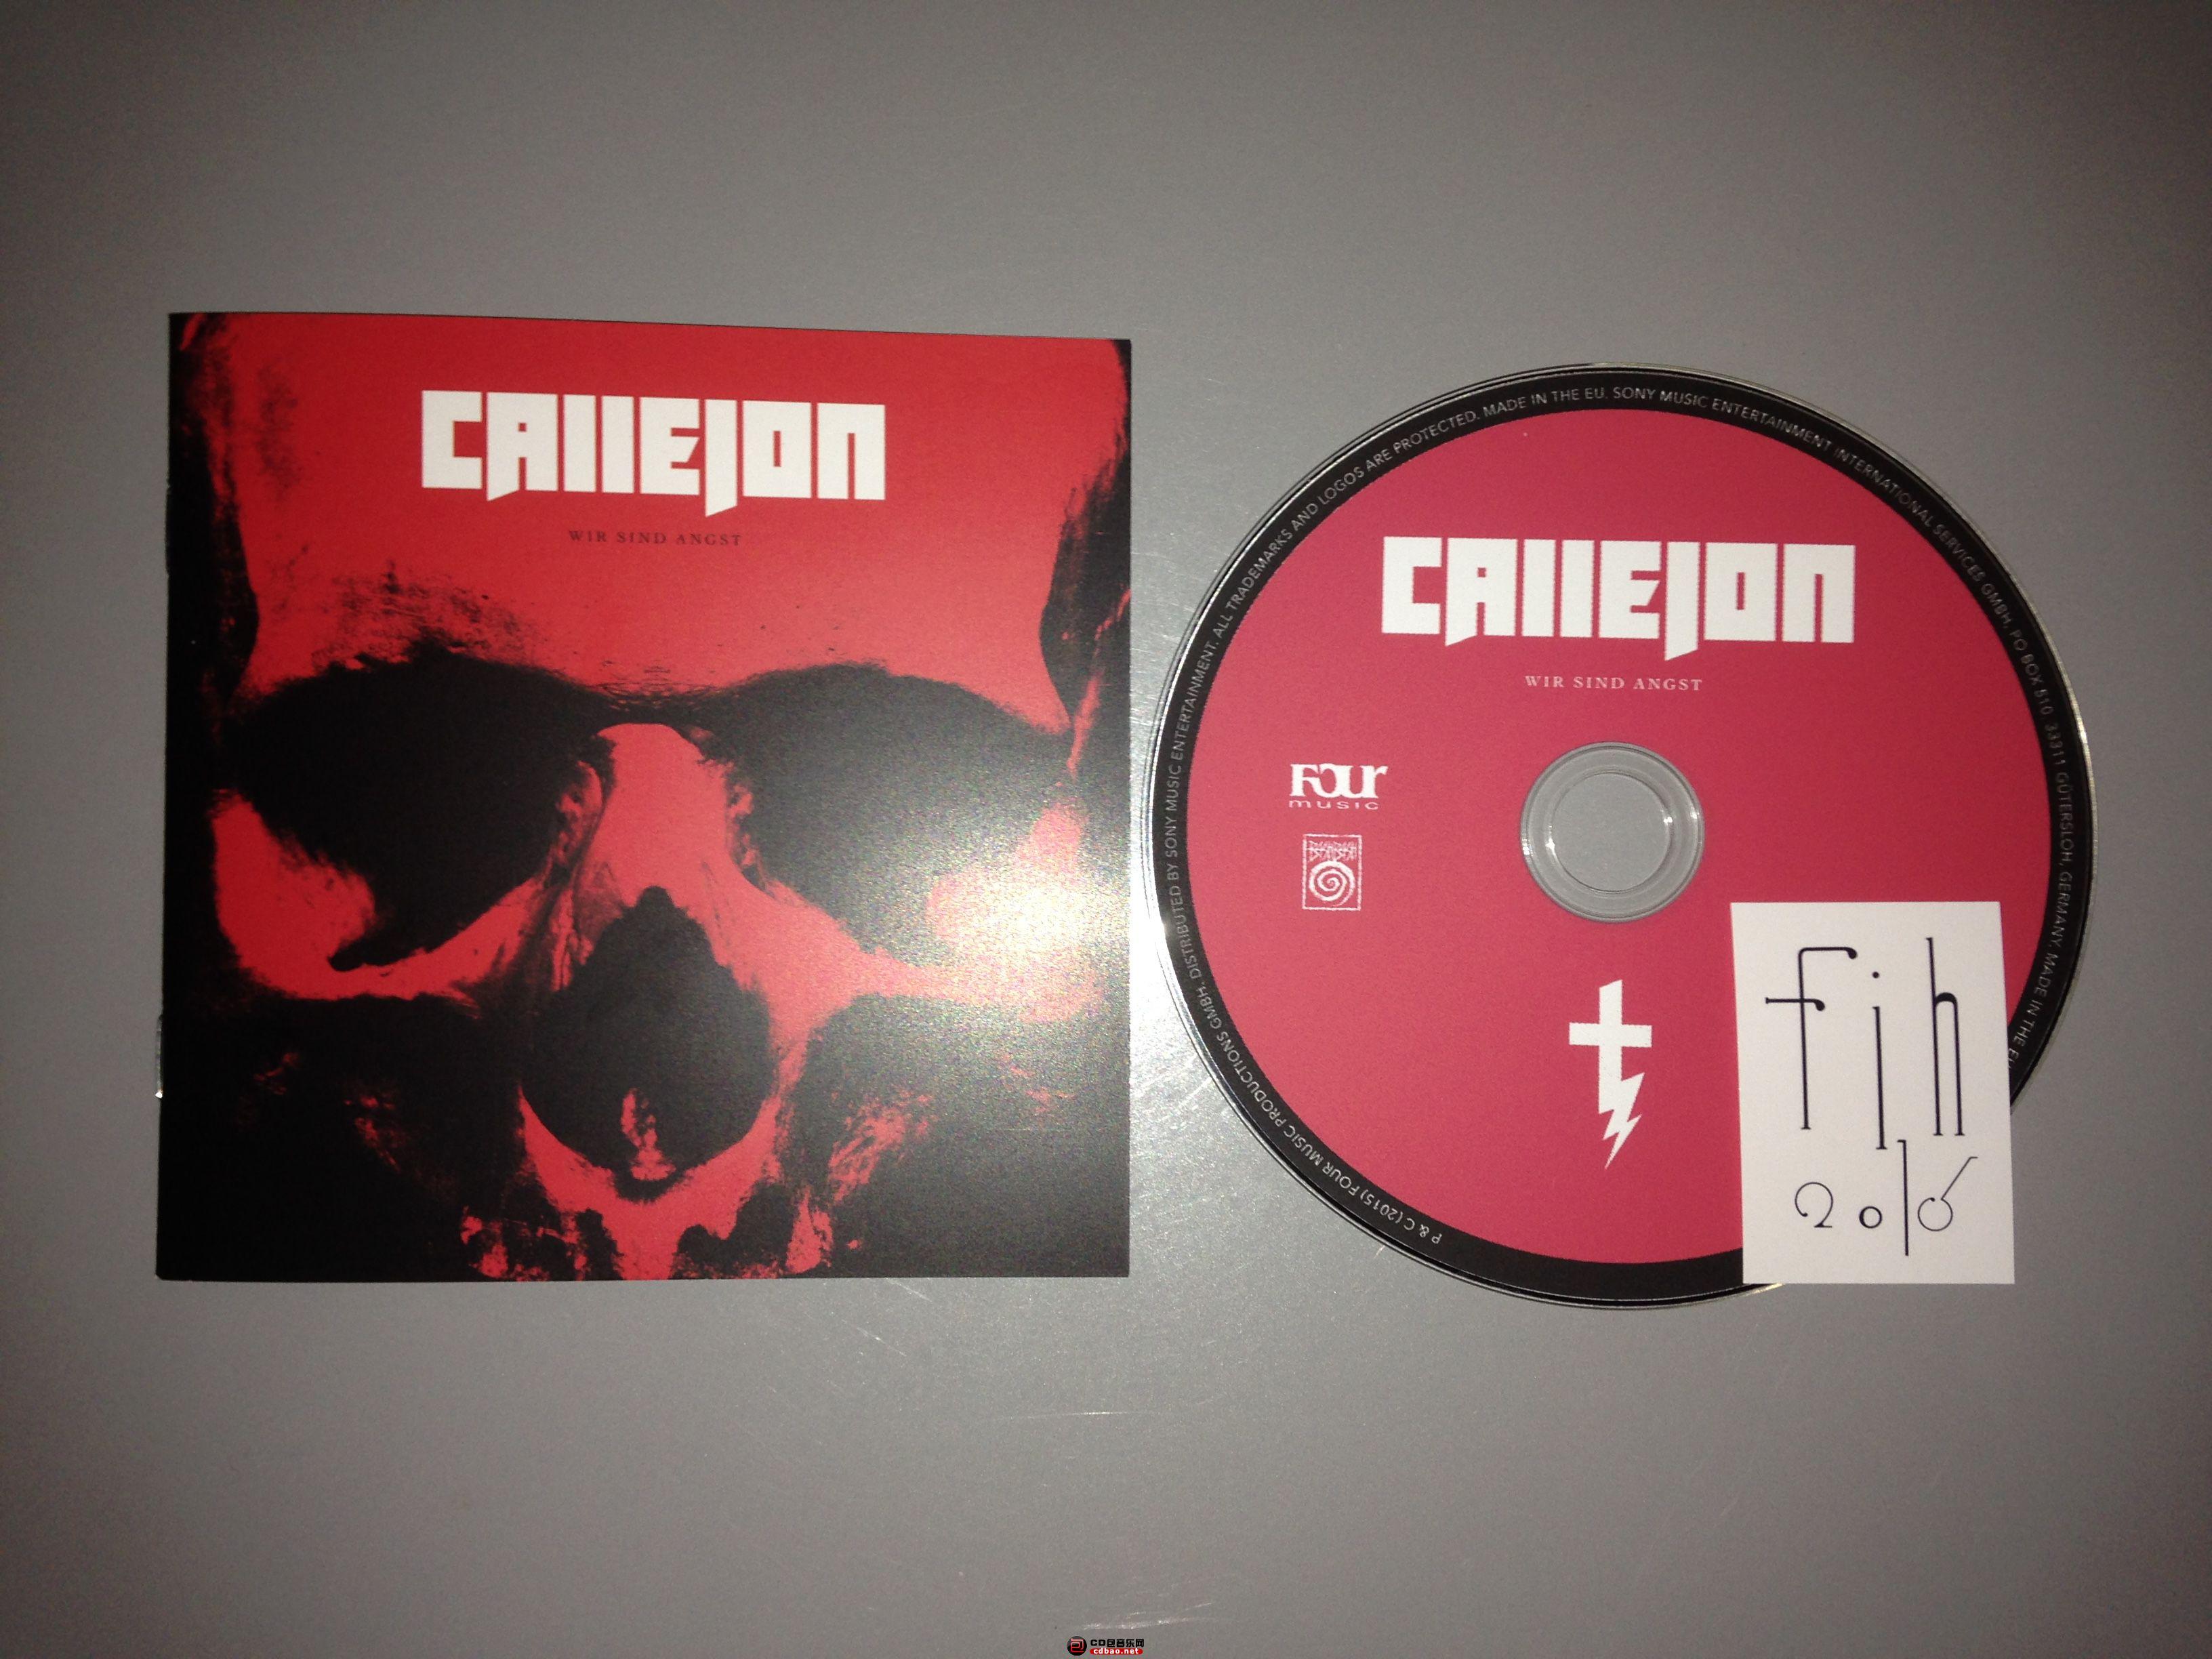 00-callejon-wir_sind_angst-de-cd-flac-2015.jpg